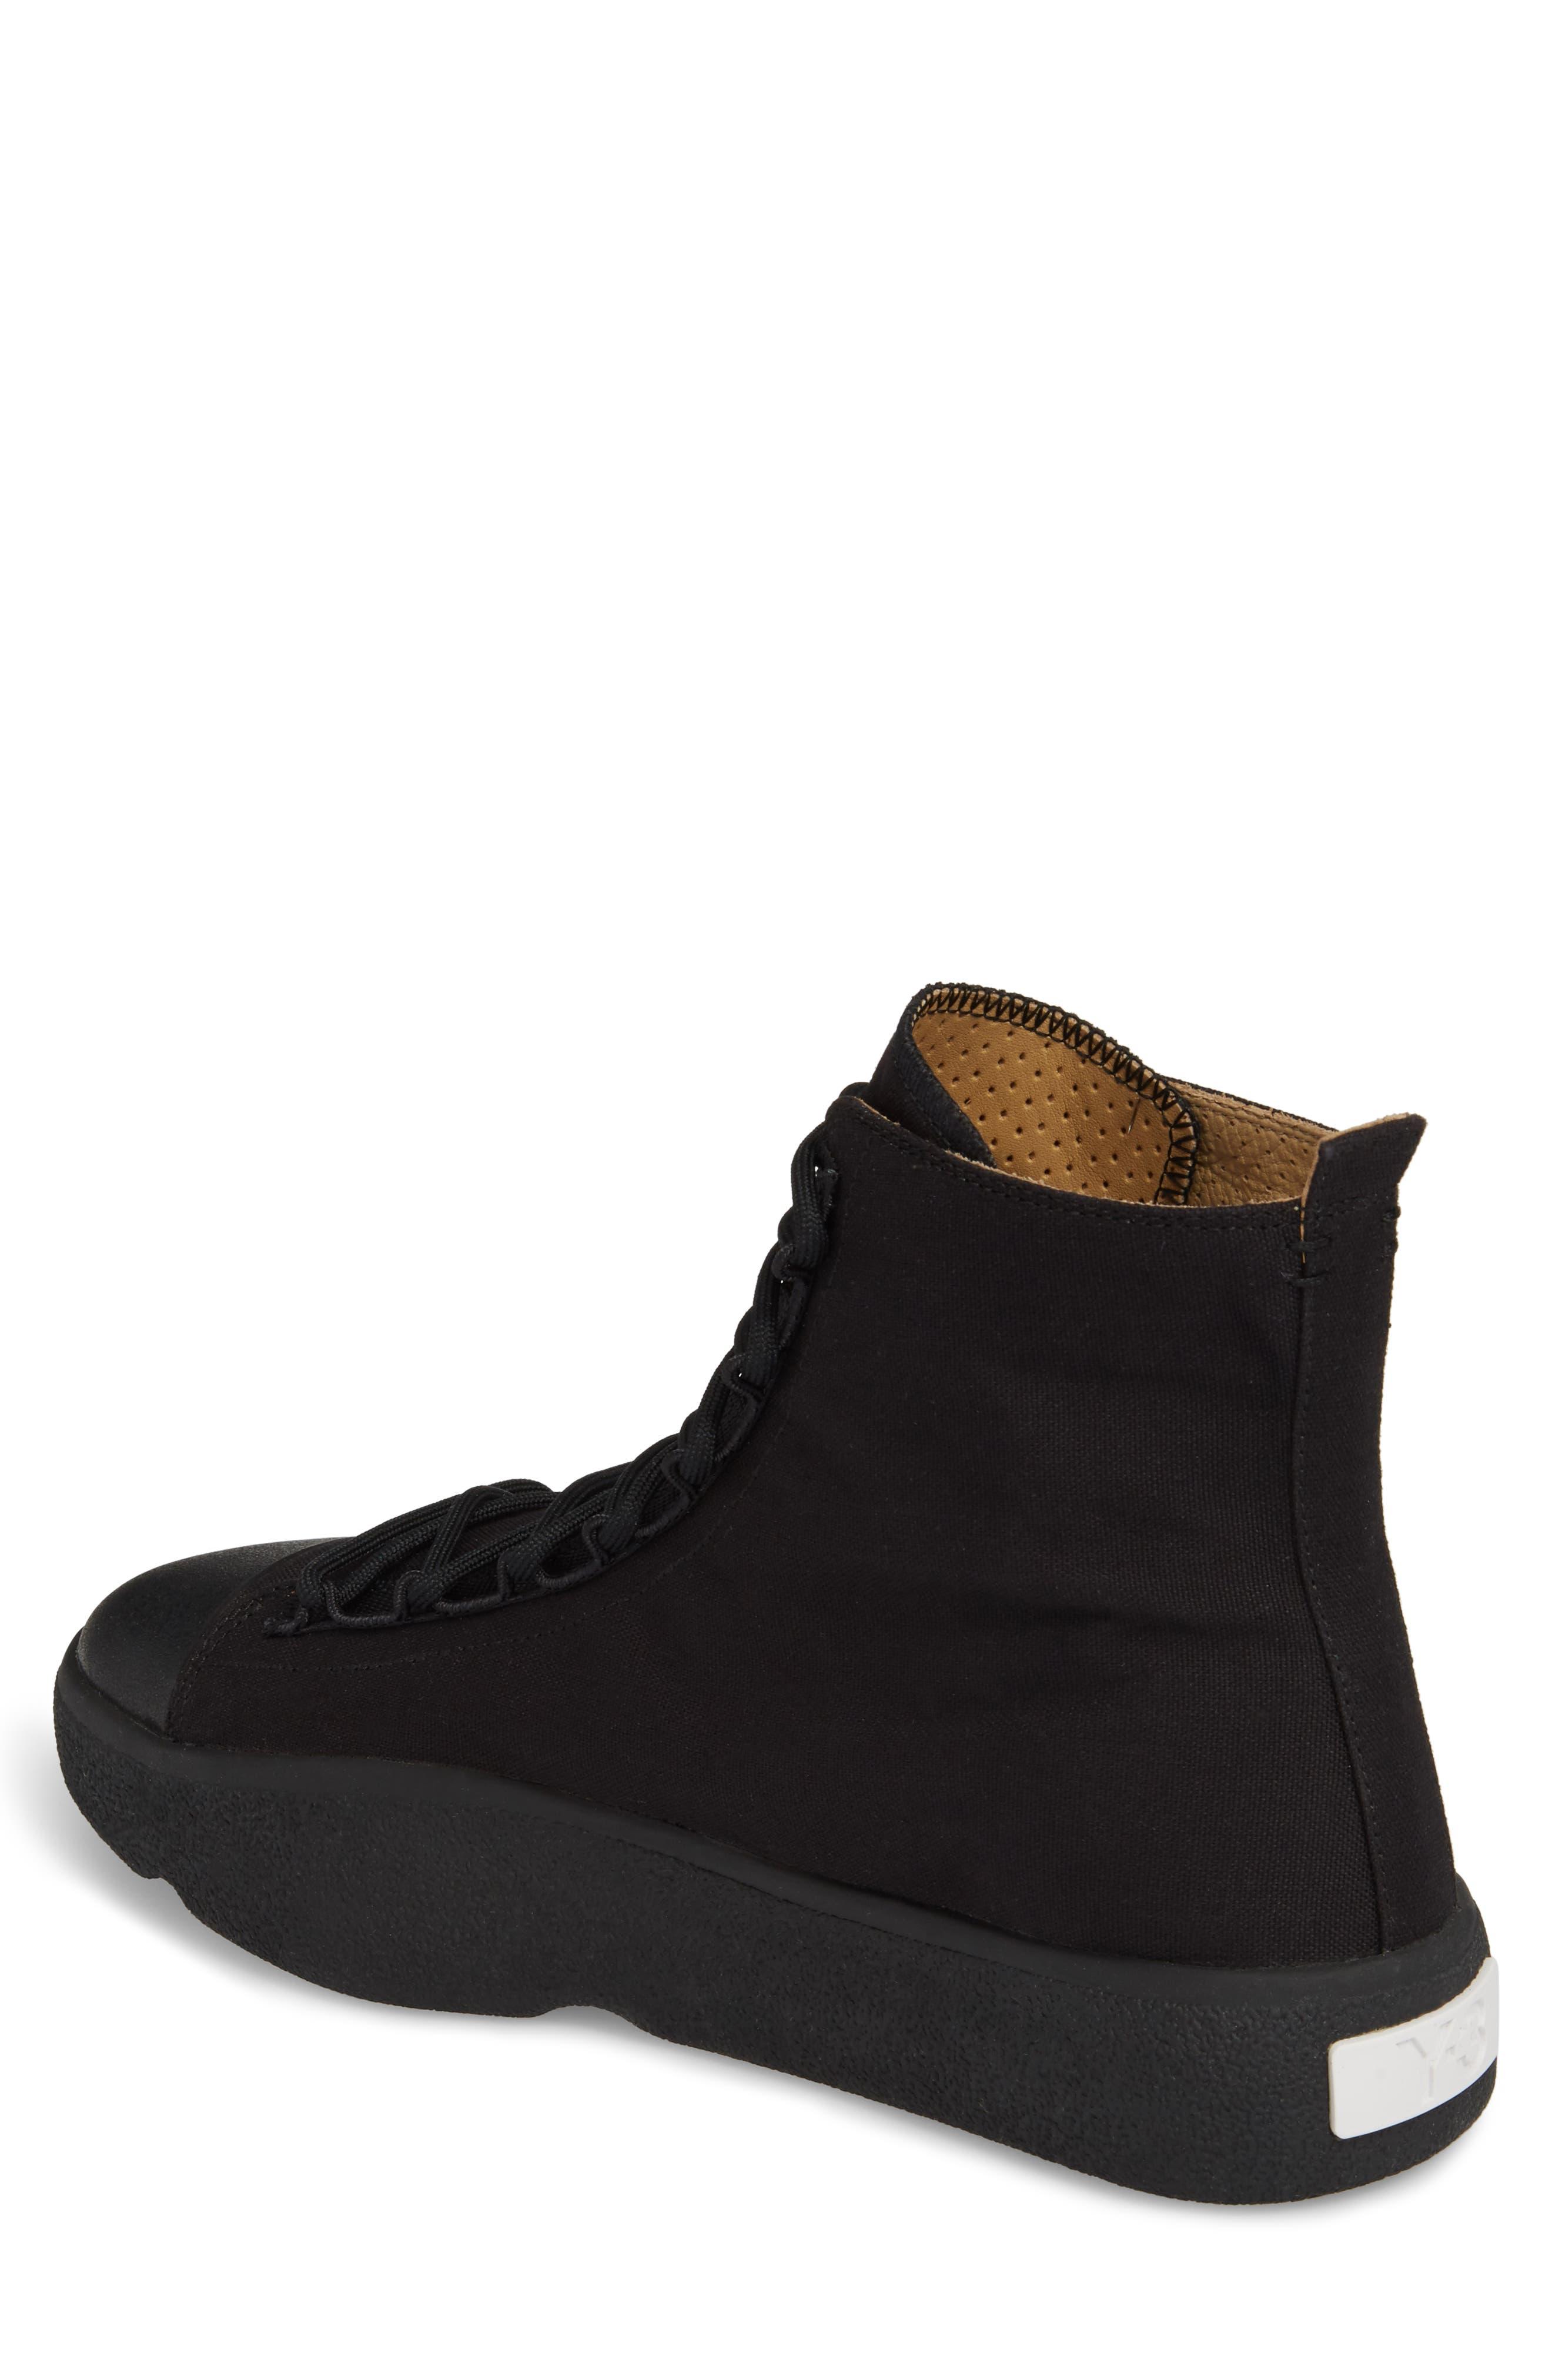 x adidas Bashyo High Top Sneaker,                             Alternate thumbnail 2, color,                             Black